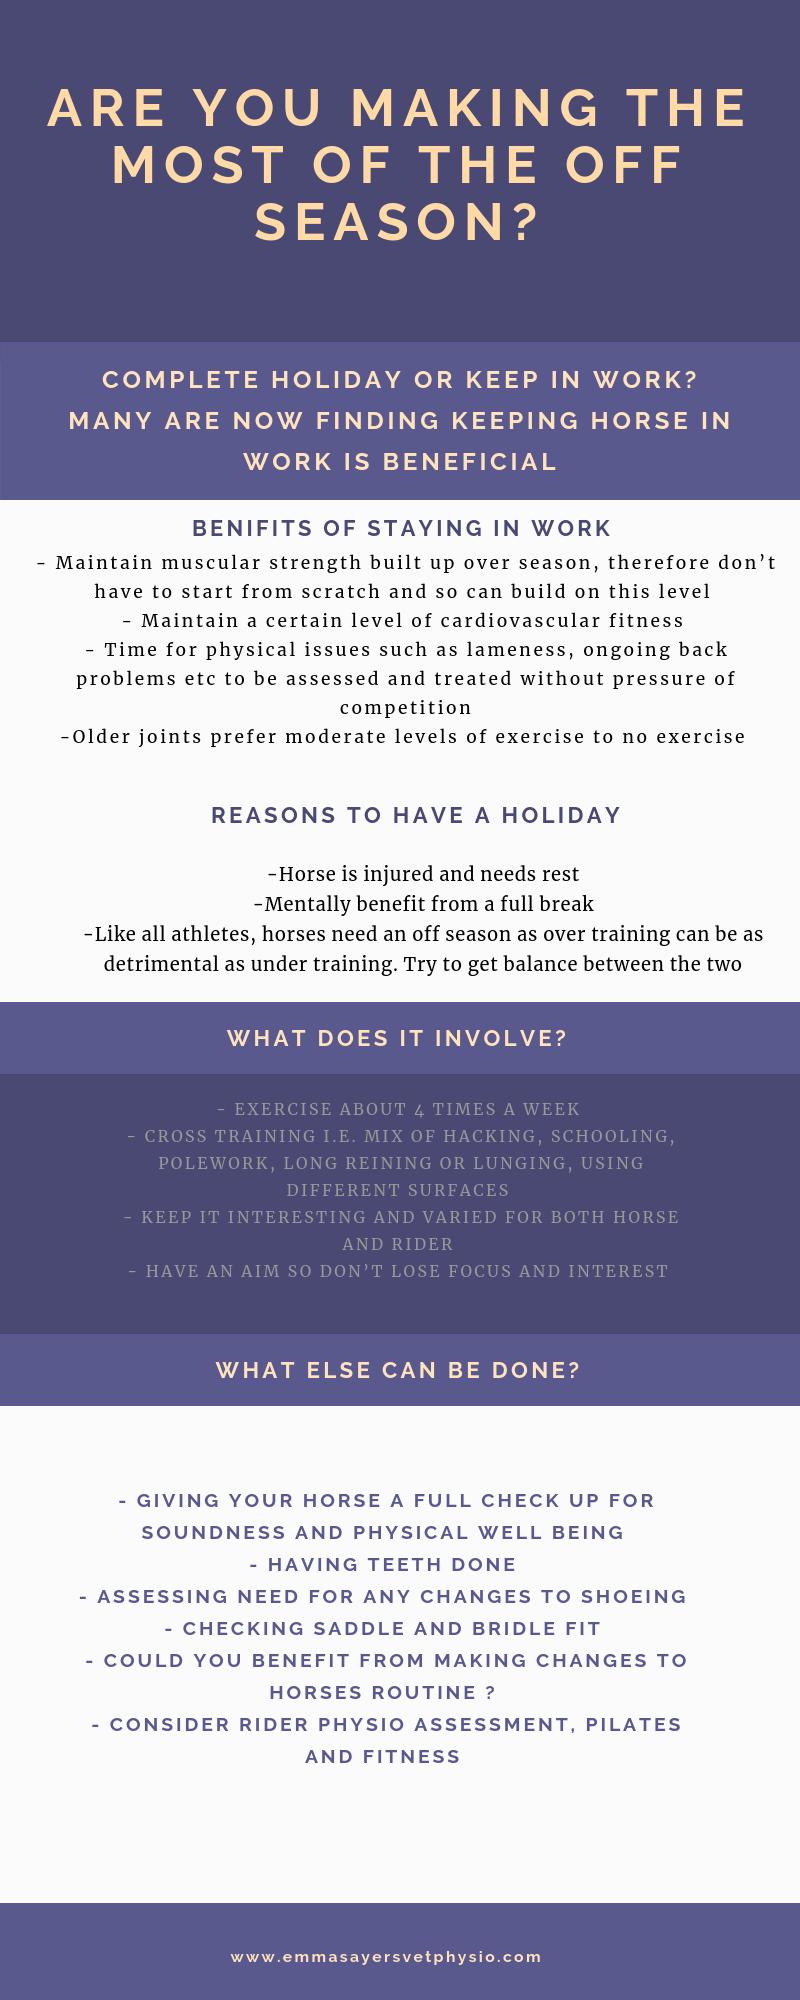 Horse physio off season advice